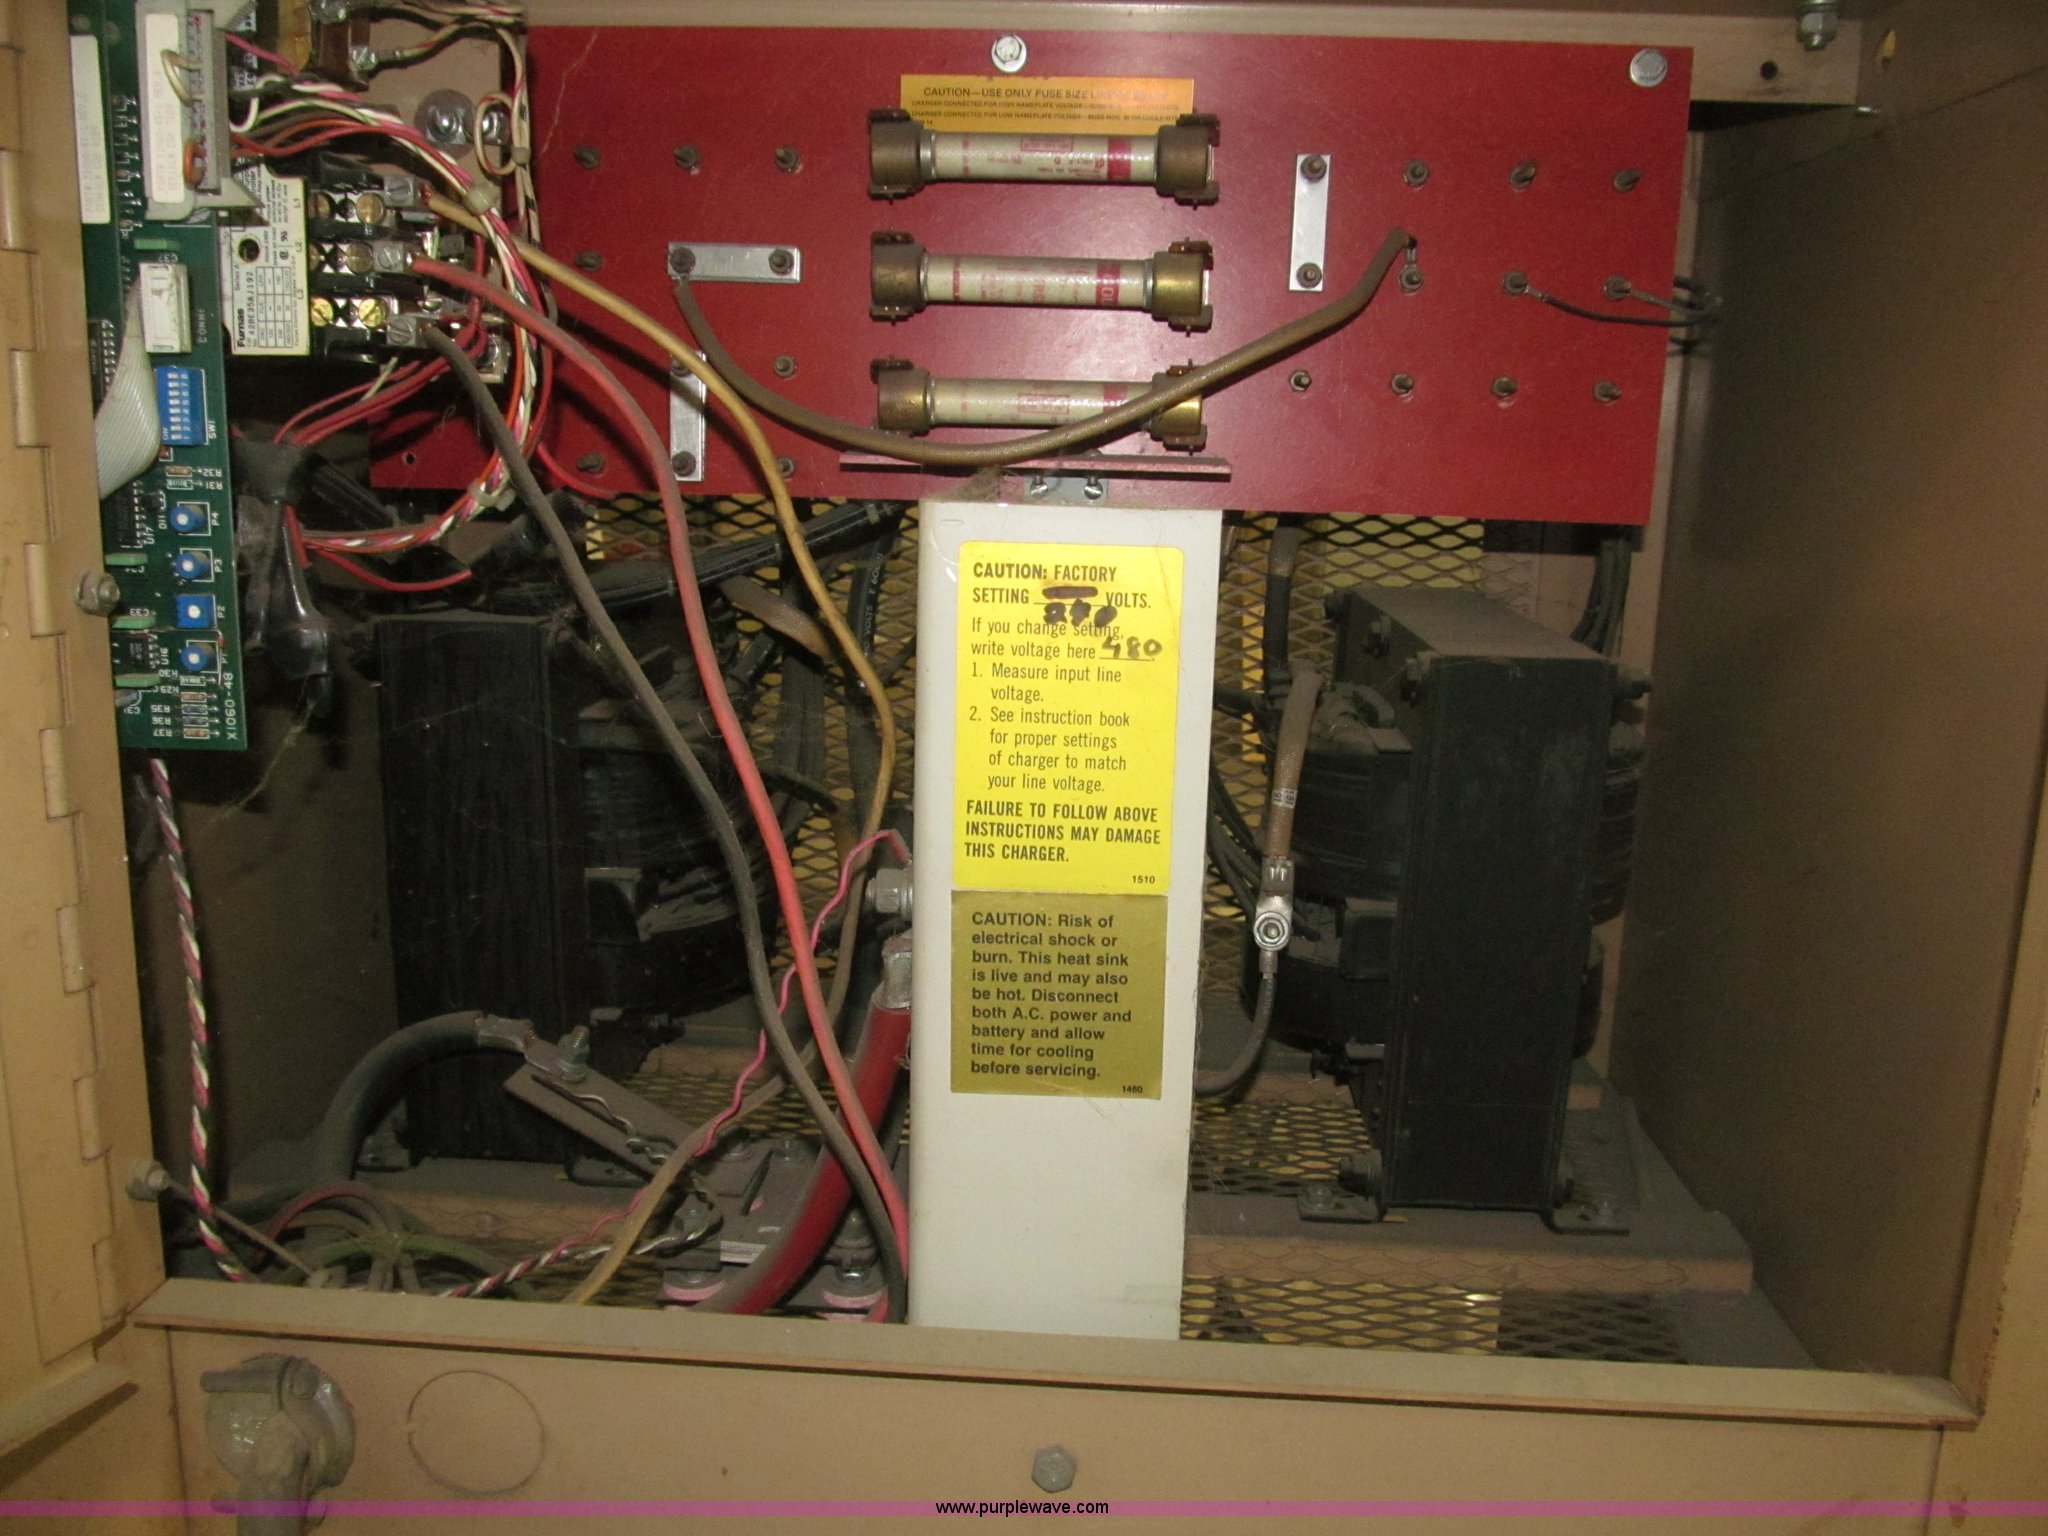 Manual hertner 1000 battery charger manual.